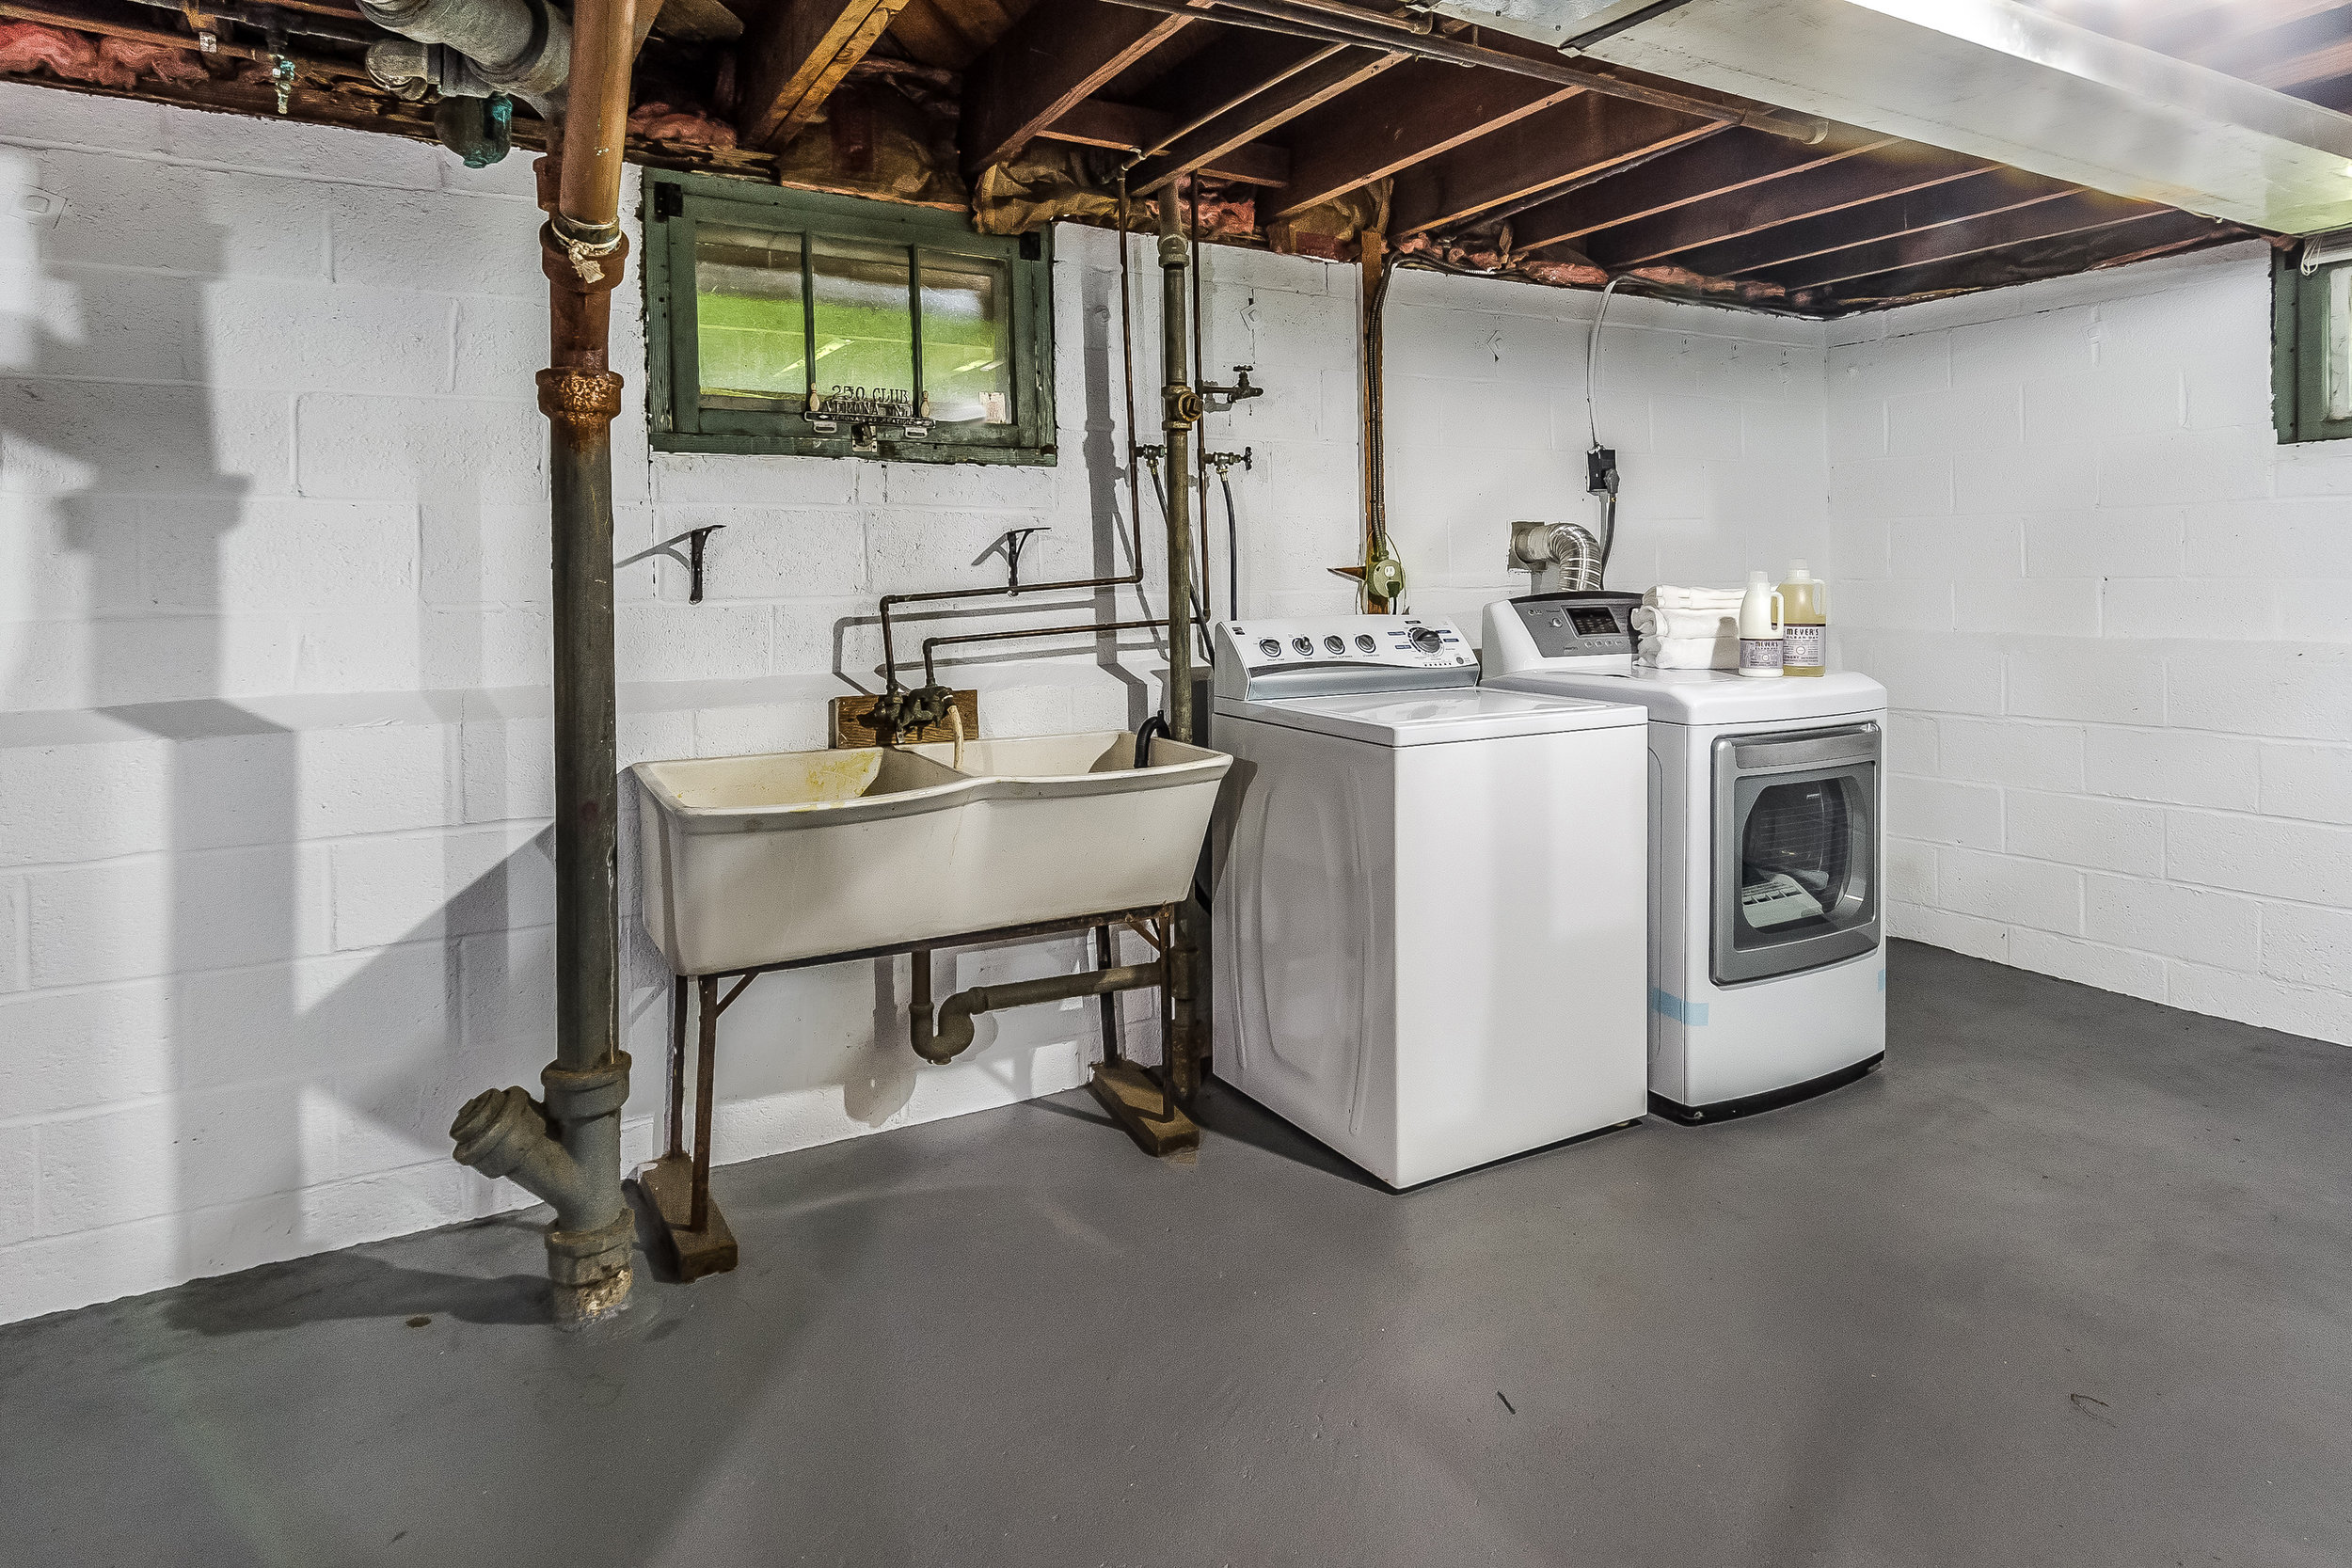 034-photo-unfinished-basement-5787034.jpg